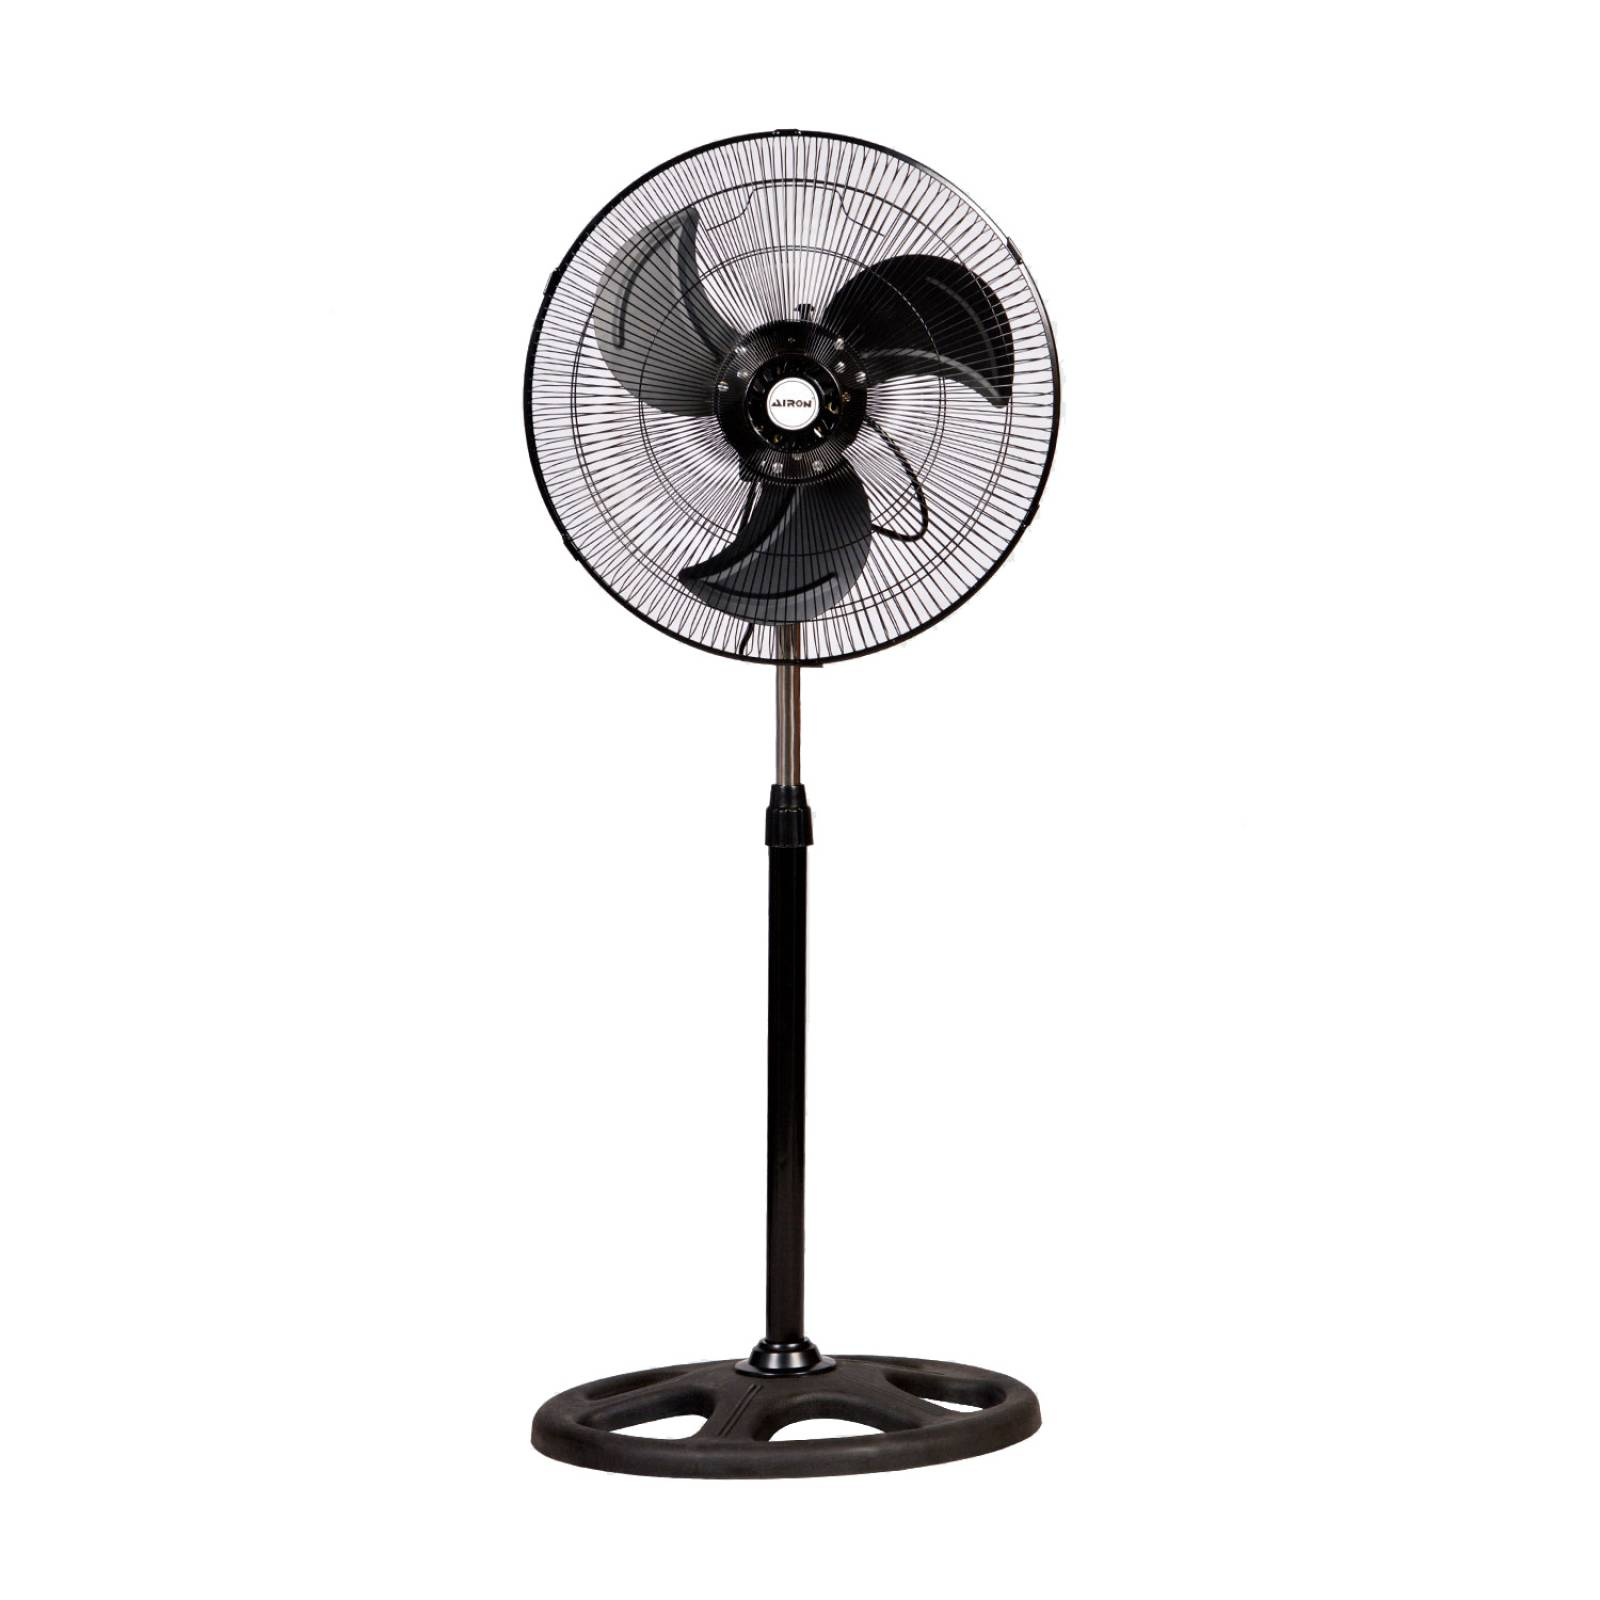 Ventilador Metalico Pedestal 3 en 1 18? SFM-45 AIRON